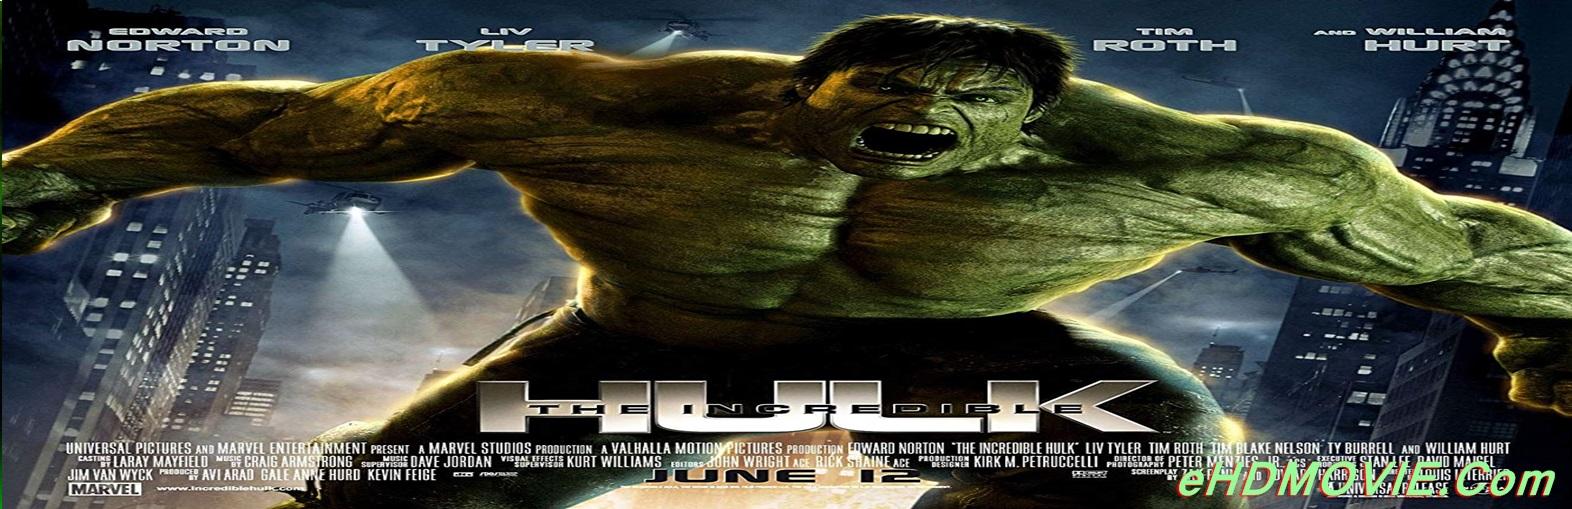 The Incredible Hulk 2008 Full Movie Dual Audio [Hindi – English] 1080p - 720p - 480p ORG BRRip 450MB - 1.2GB - 3GB ESubs Free Download